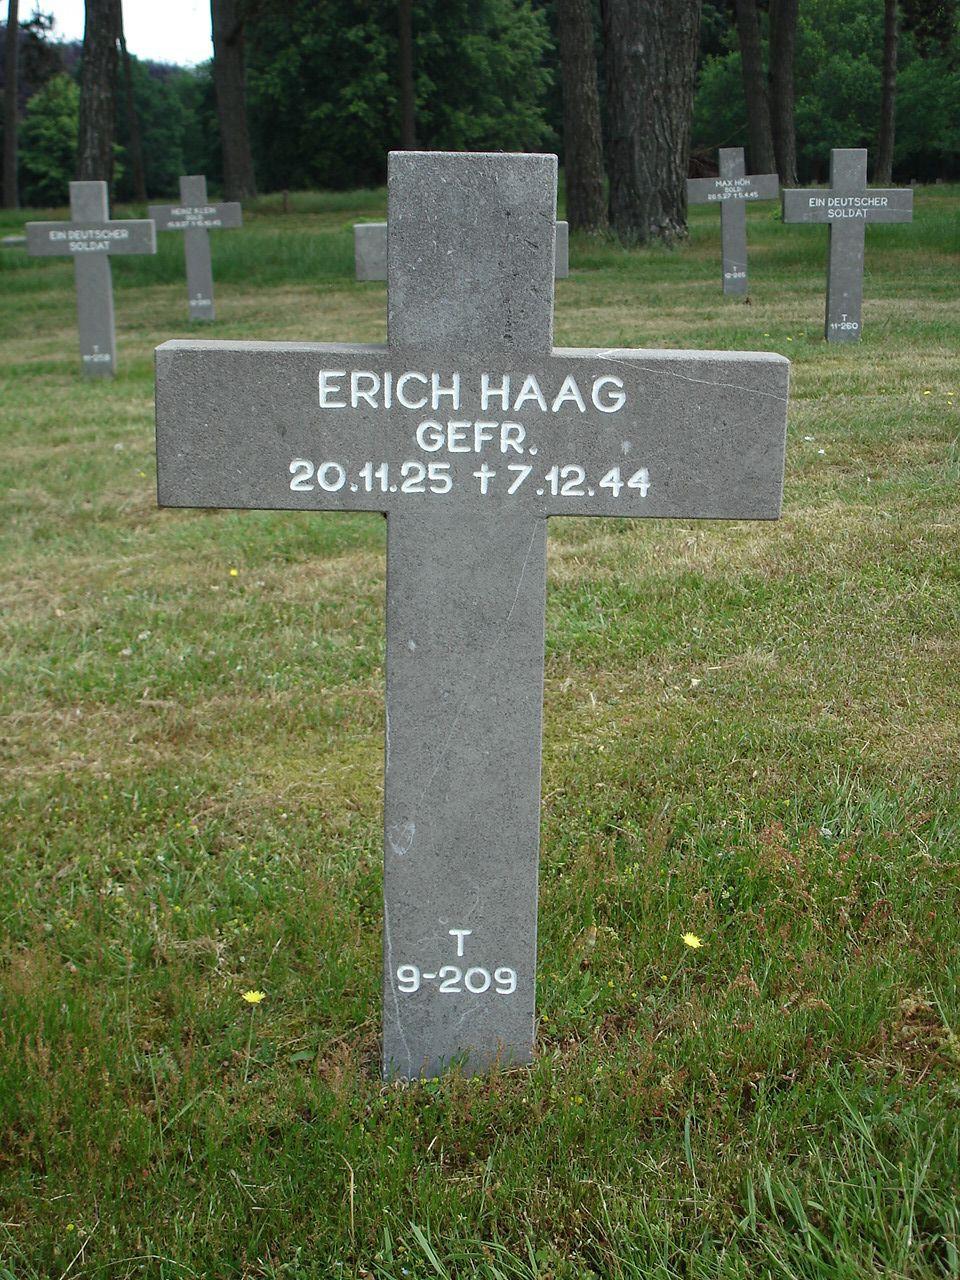 Erich Haag